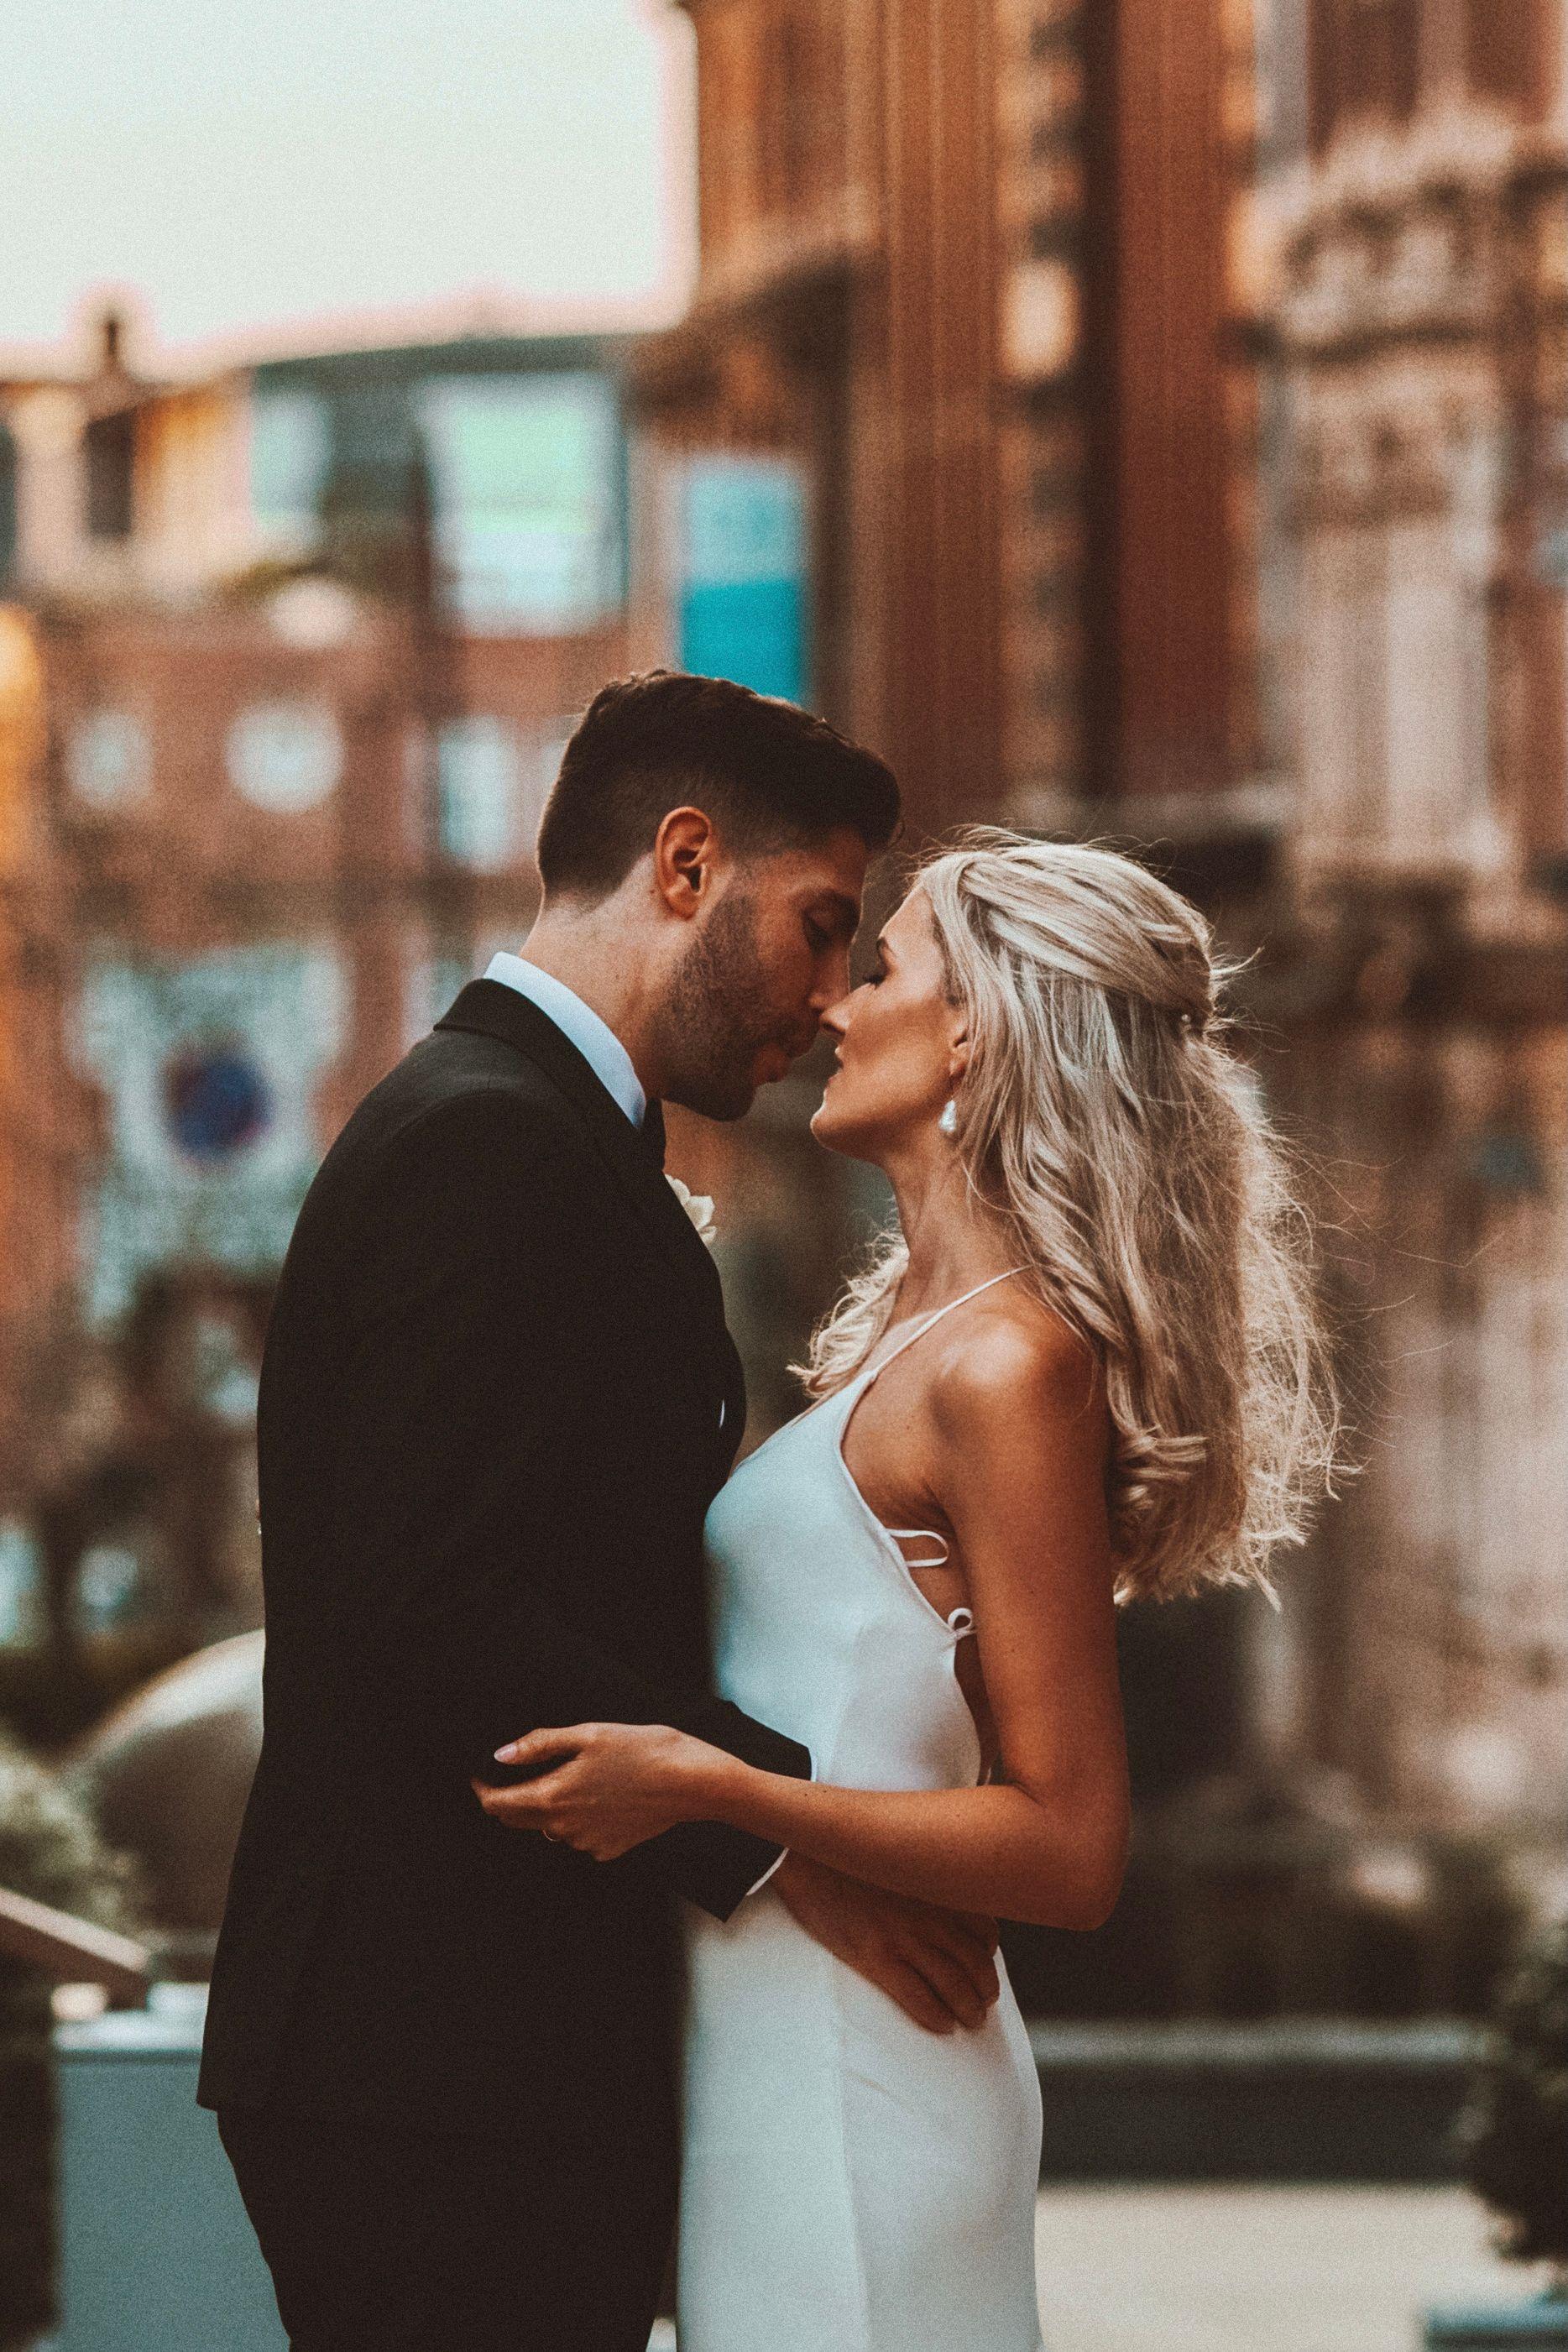 ytz wedding photography 7df2b146 96fd 4ba9 9970 43071c289992